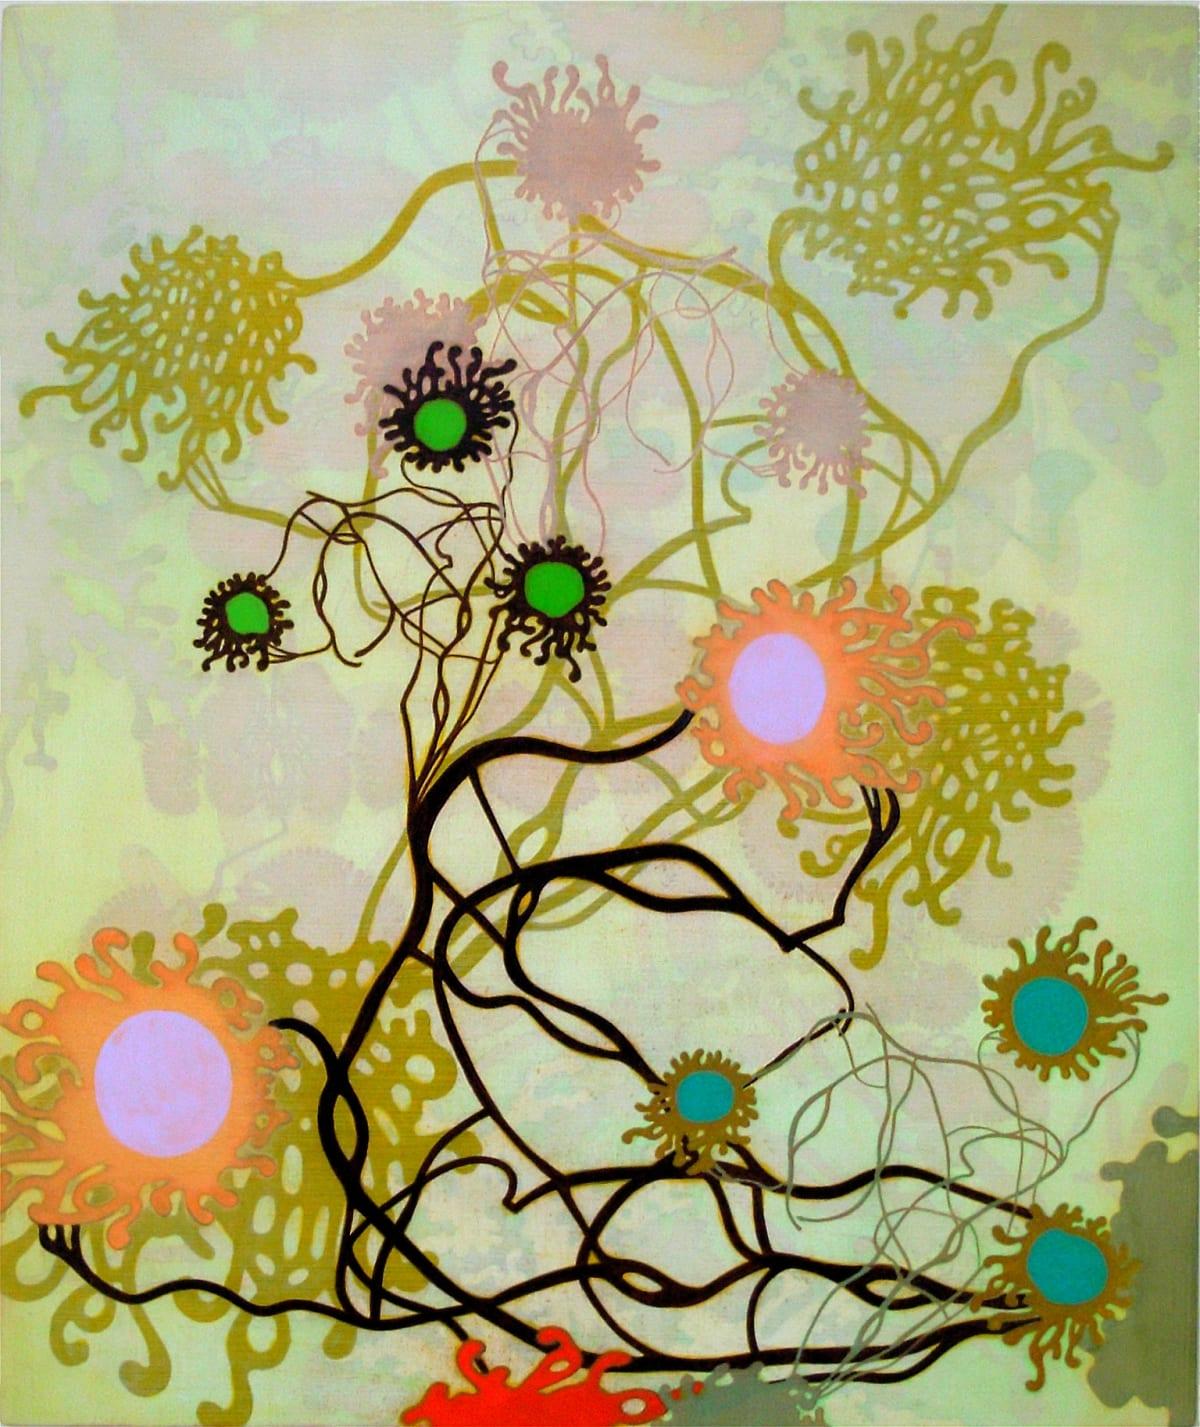 Annette Davidek Untitled, #17-04, 2017 oil on birch panel 38 x 32 in.